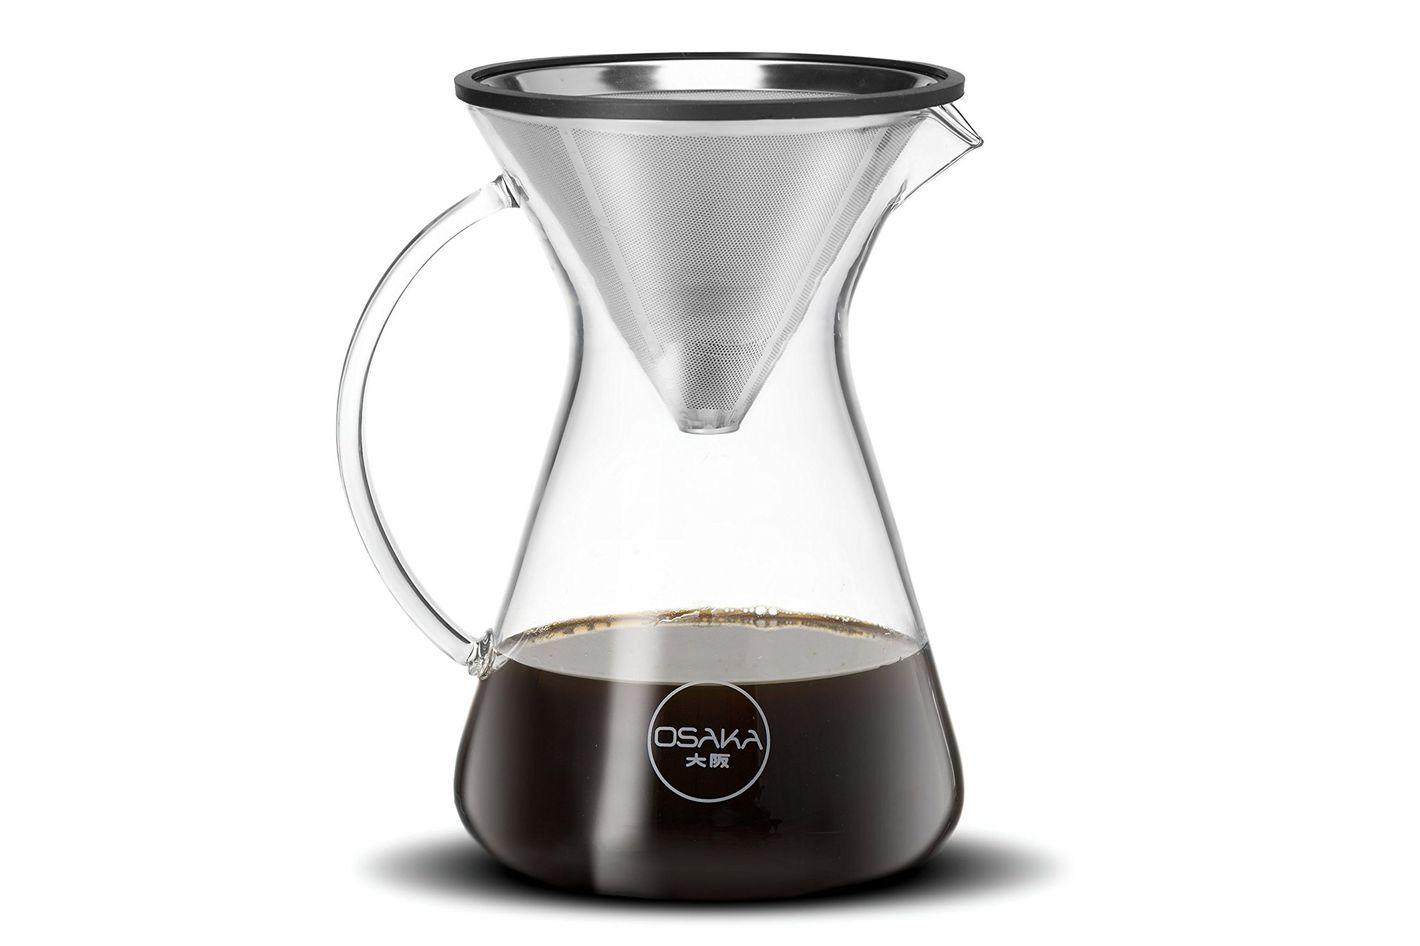 Osaka Homemade Pourover Coffeemaker